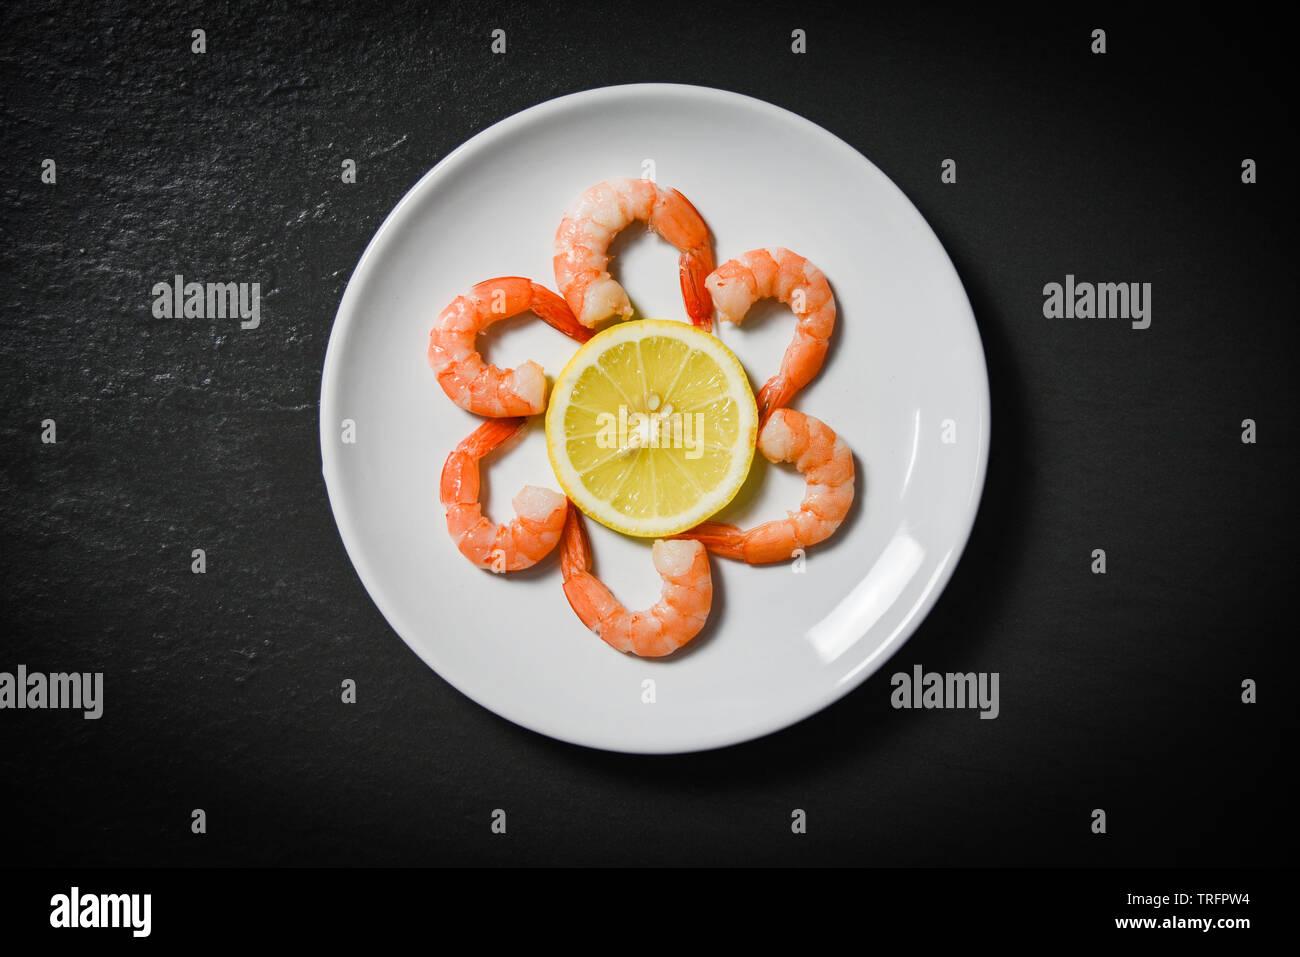 Shrimps prawns served decorate seafood plate and lemon on dark background Stock Photo